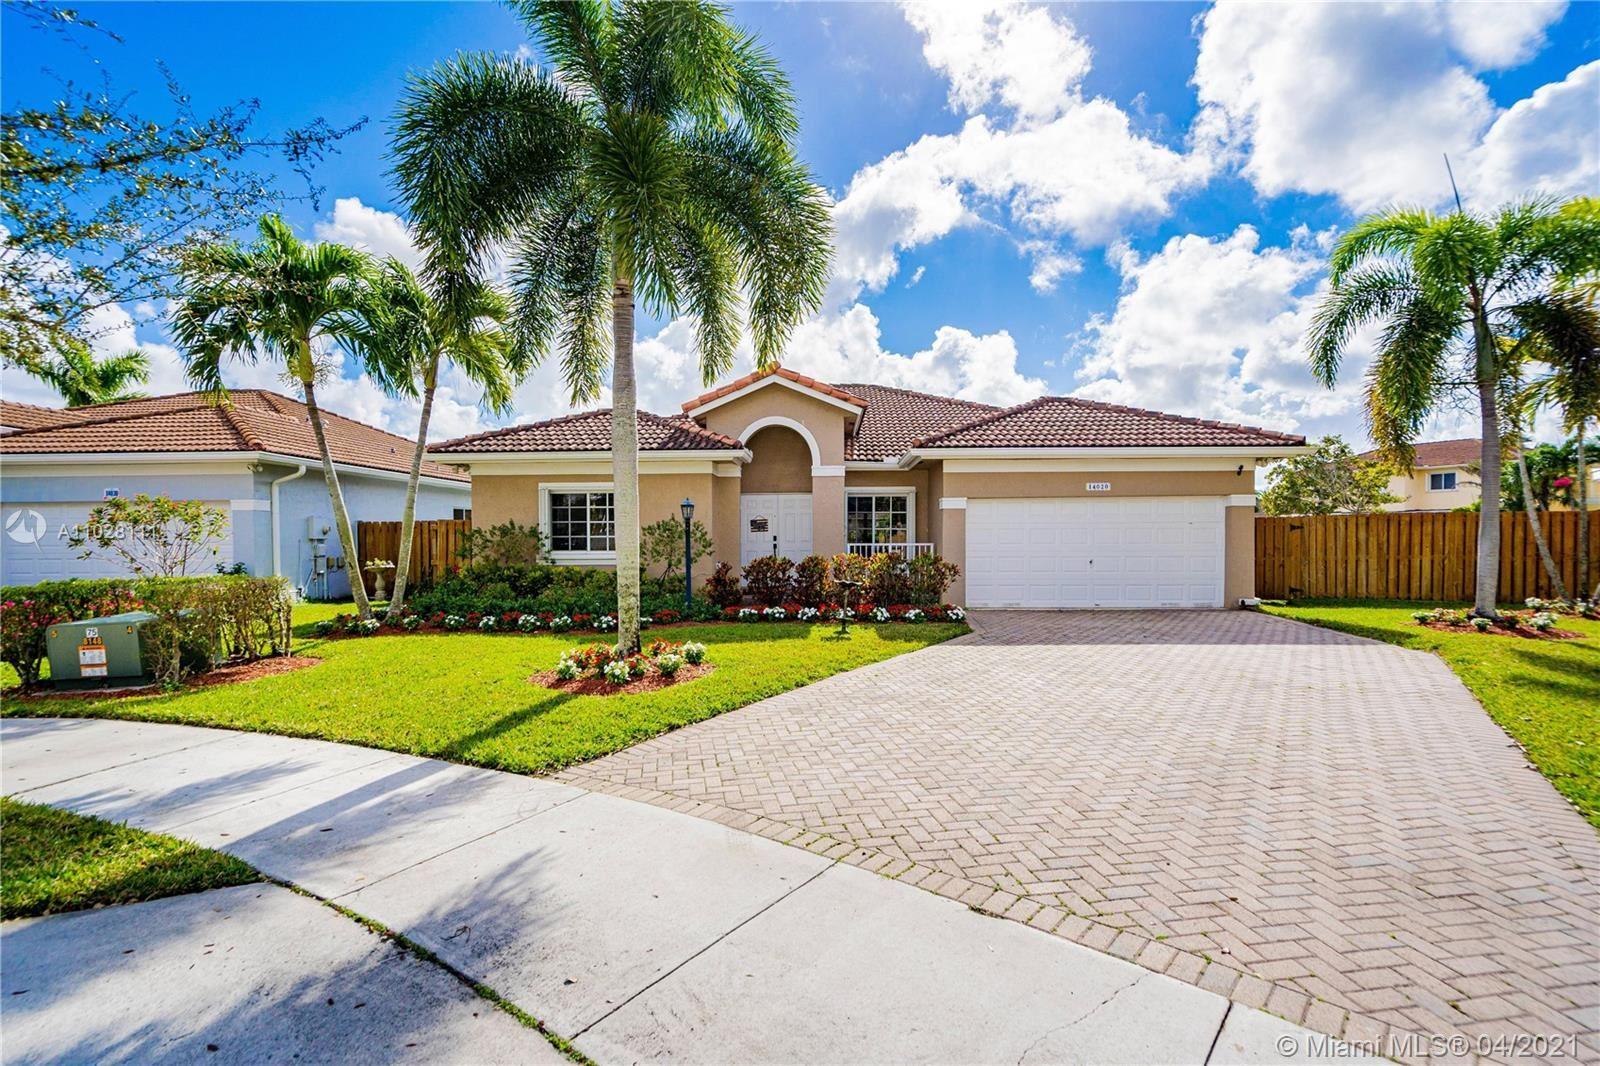 14020 SW 130 Pl, Miami, FL 33186 - #: A11028111